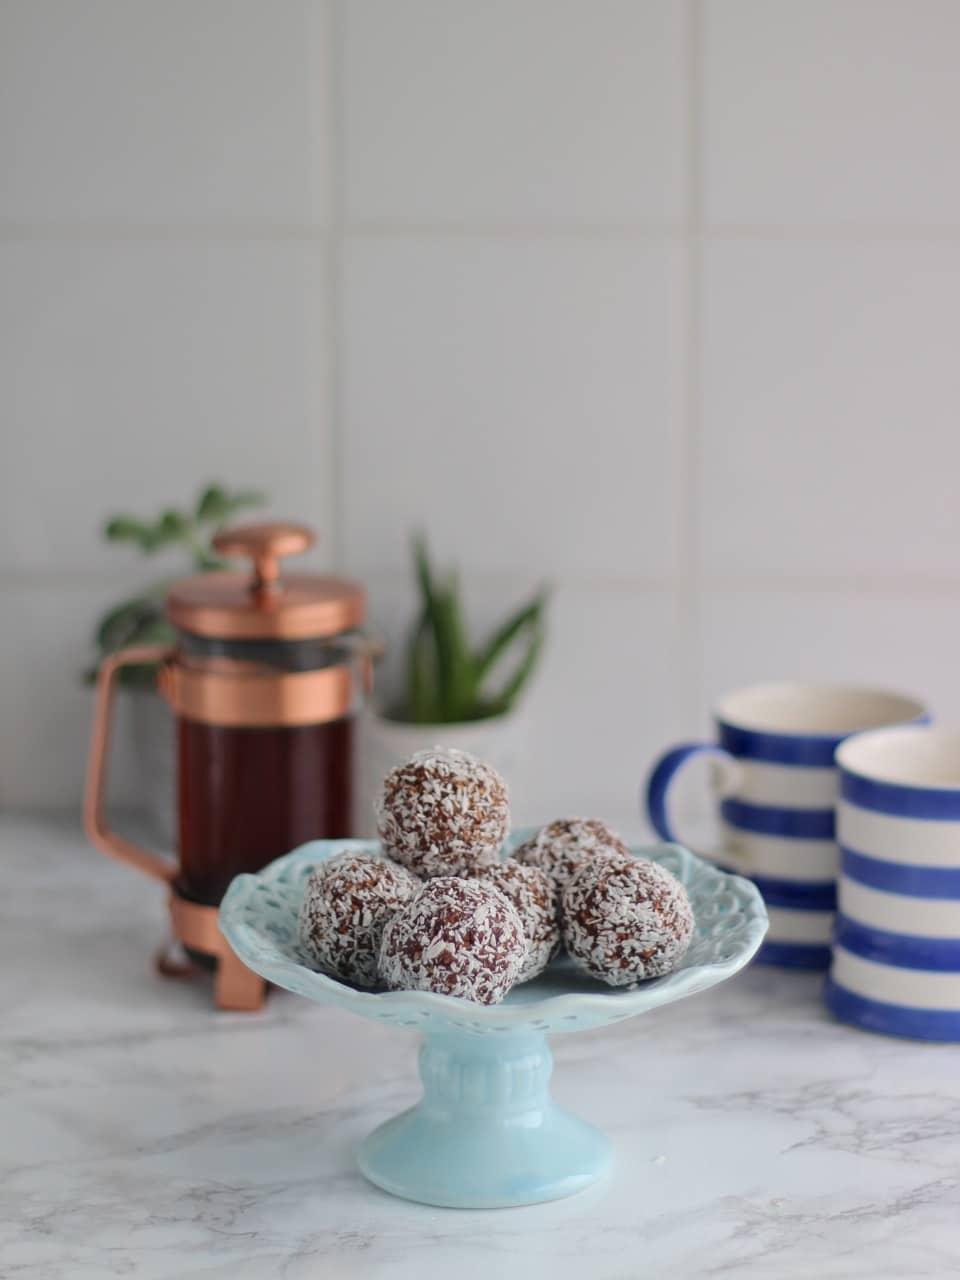 Fika, Chokladbollar, Swedish Chocolate Balls, Gluten Free, Whole Foods, Vegan Option